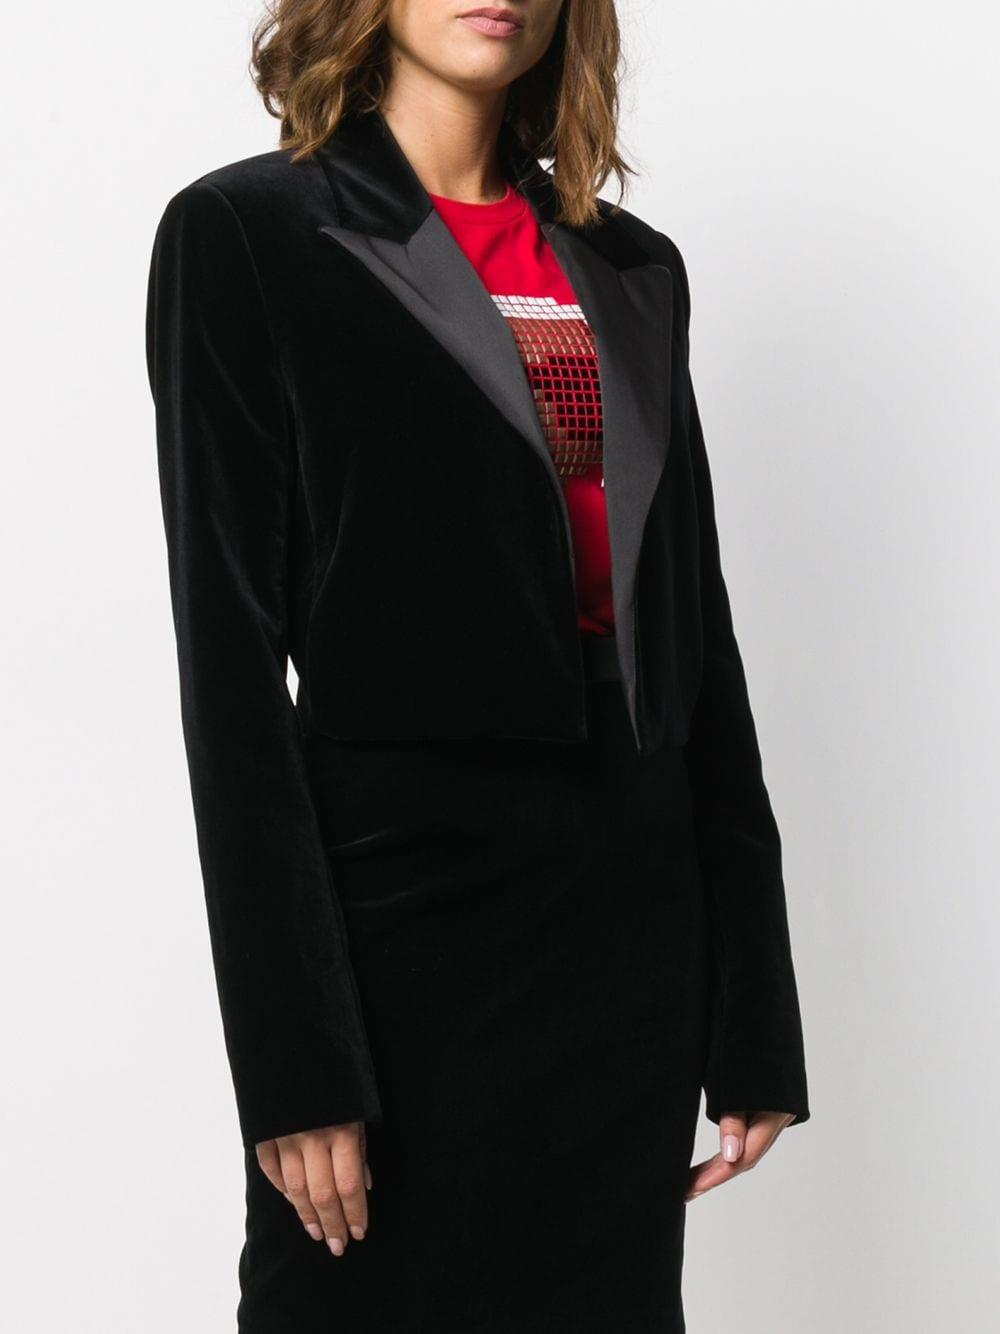 Chaqueta Karl x Carine Karl Lagerfeld de Terciopelo de color Negro